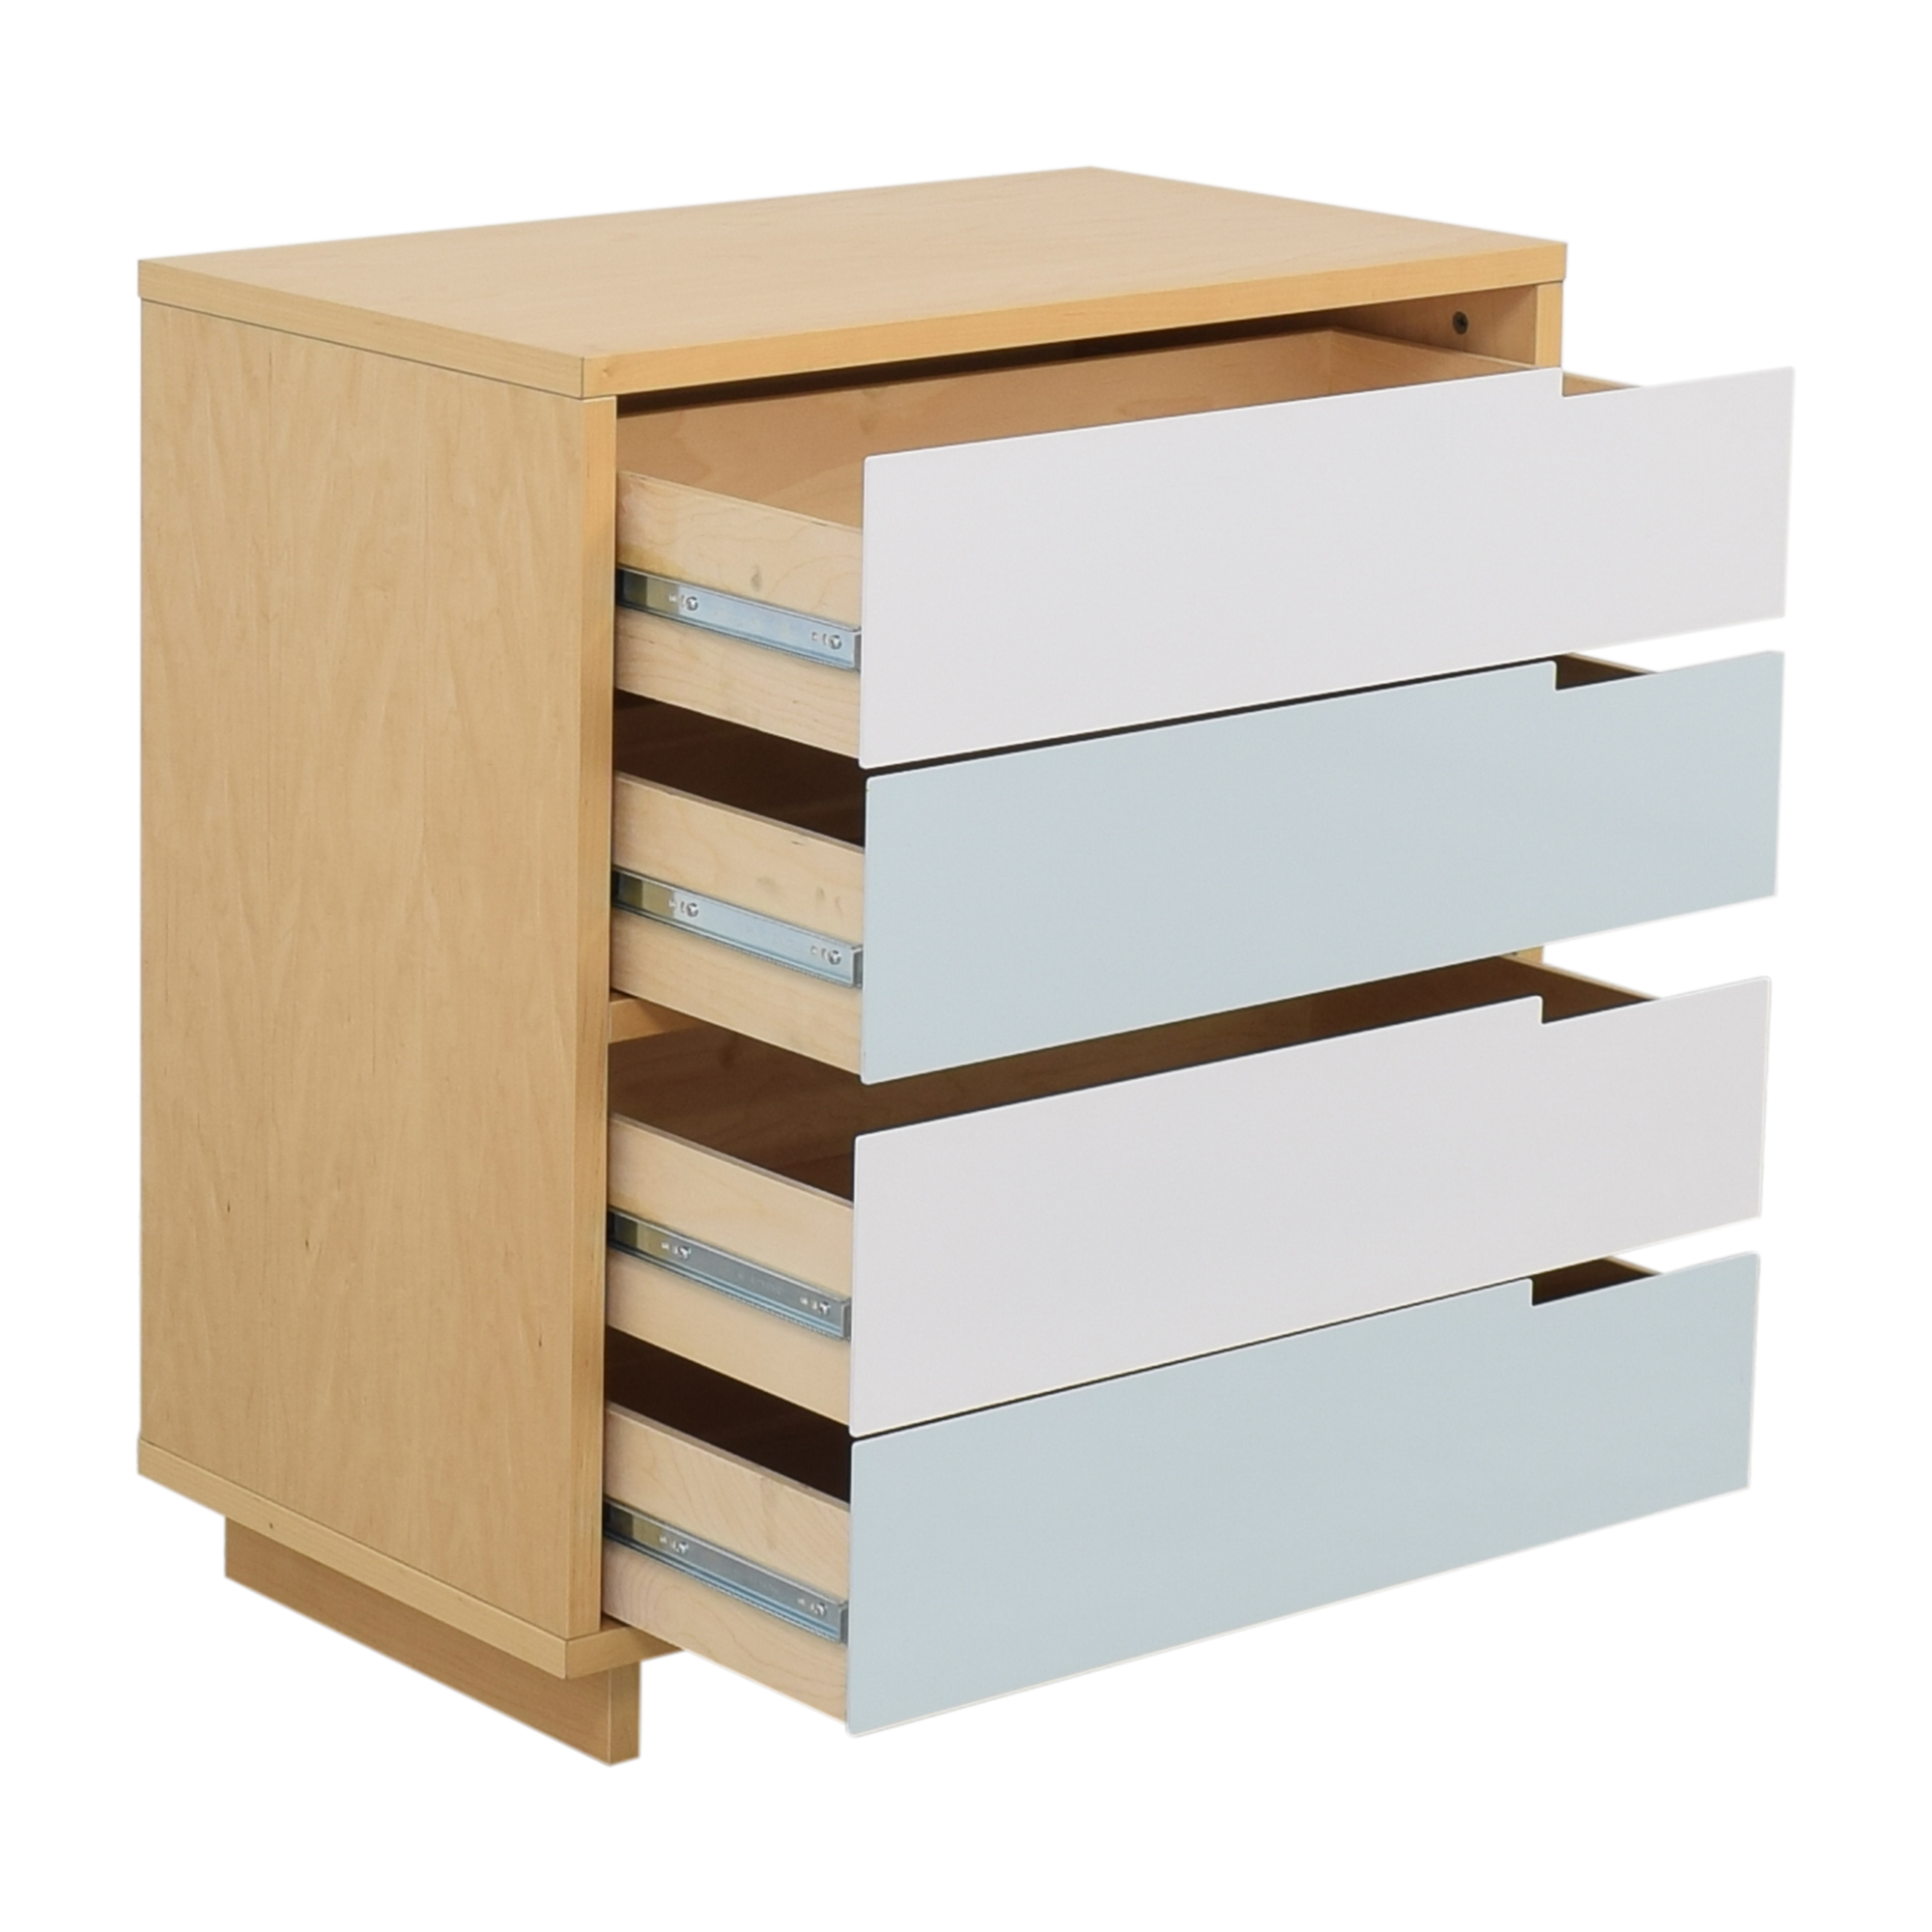 Blu Dot Blu Dot Modu-licious #4 Dresser Storage